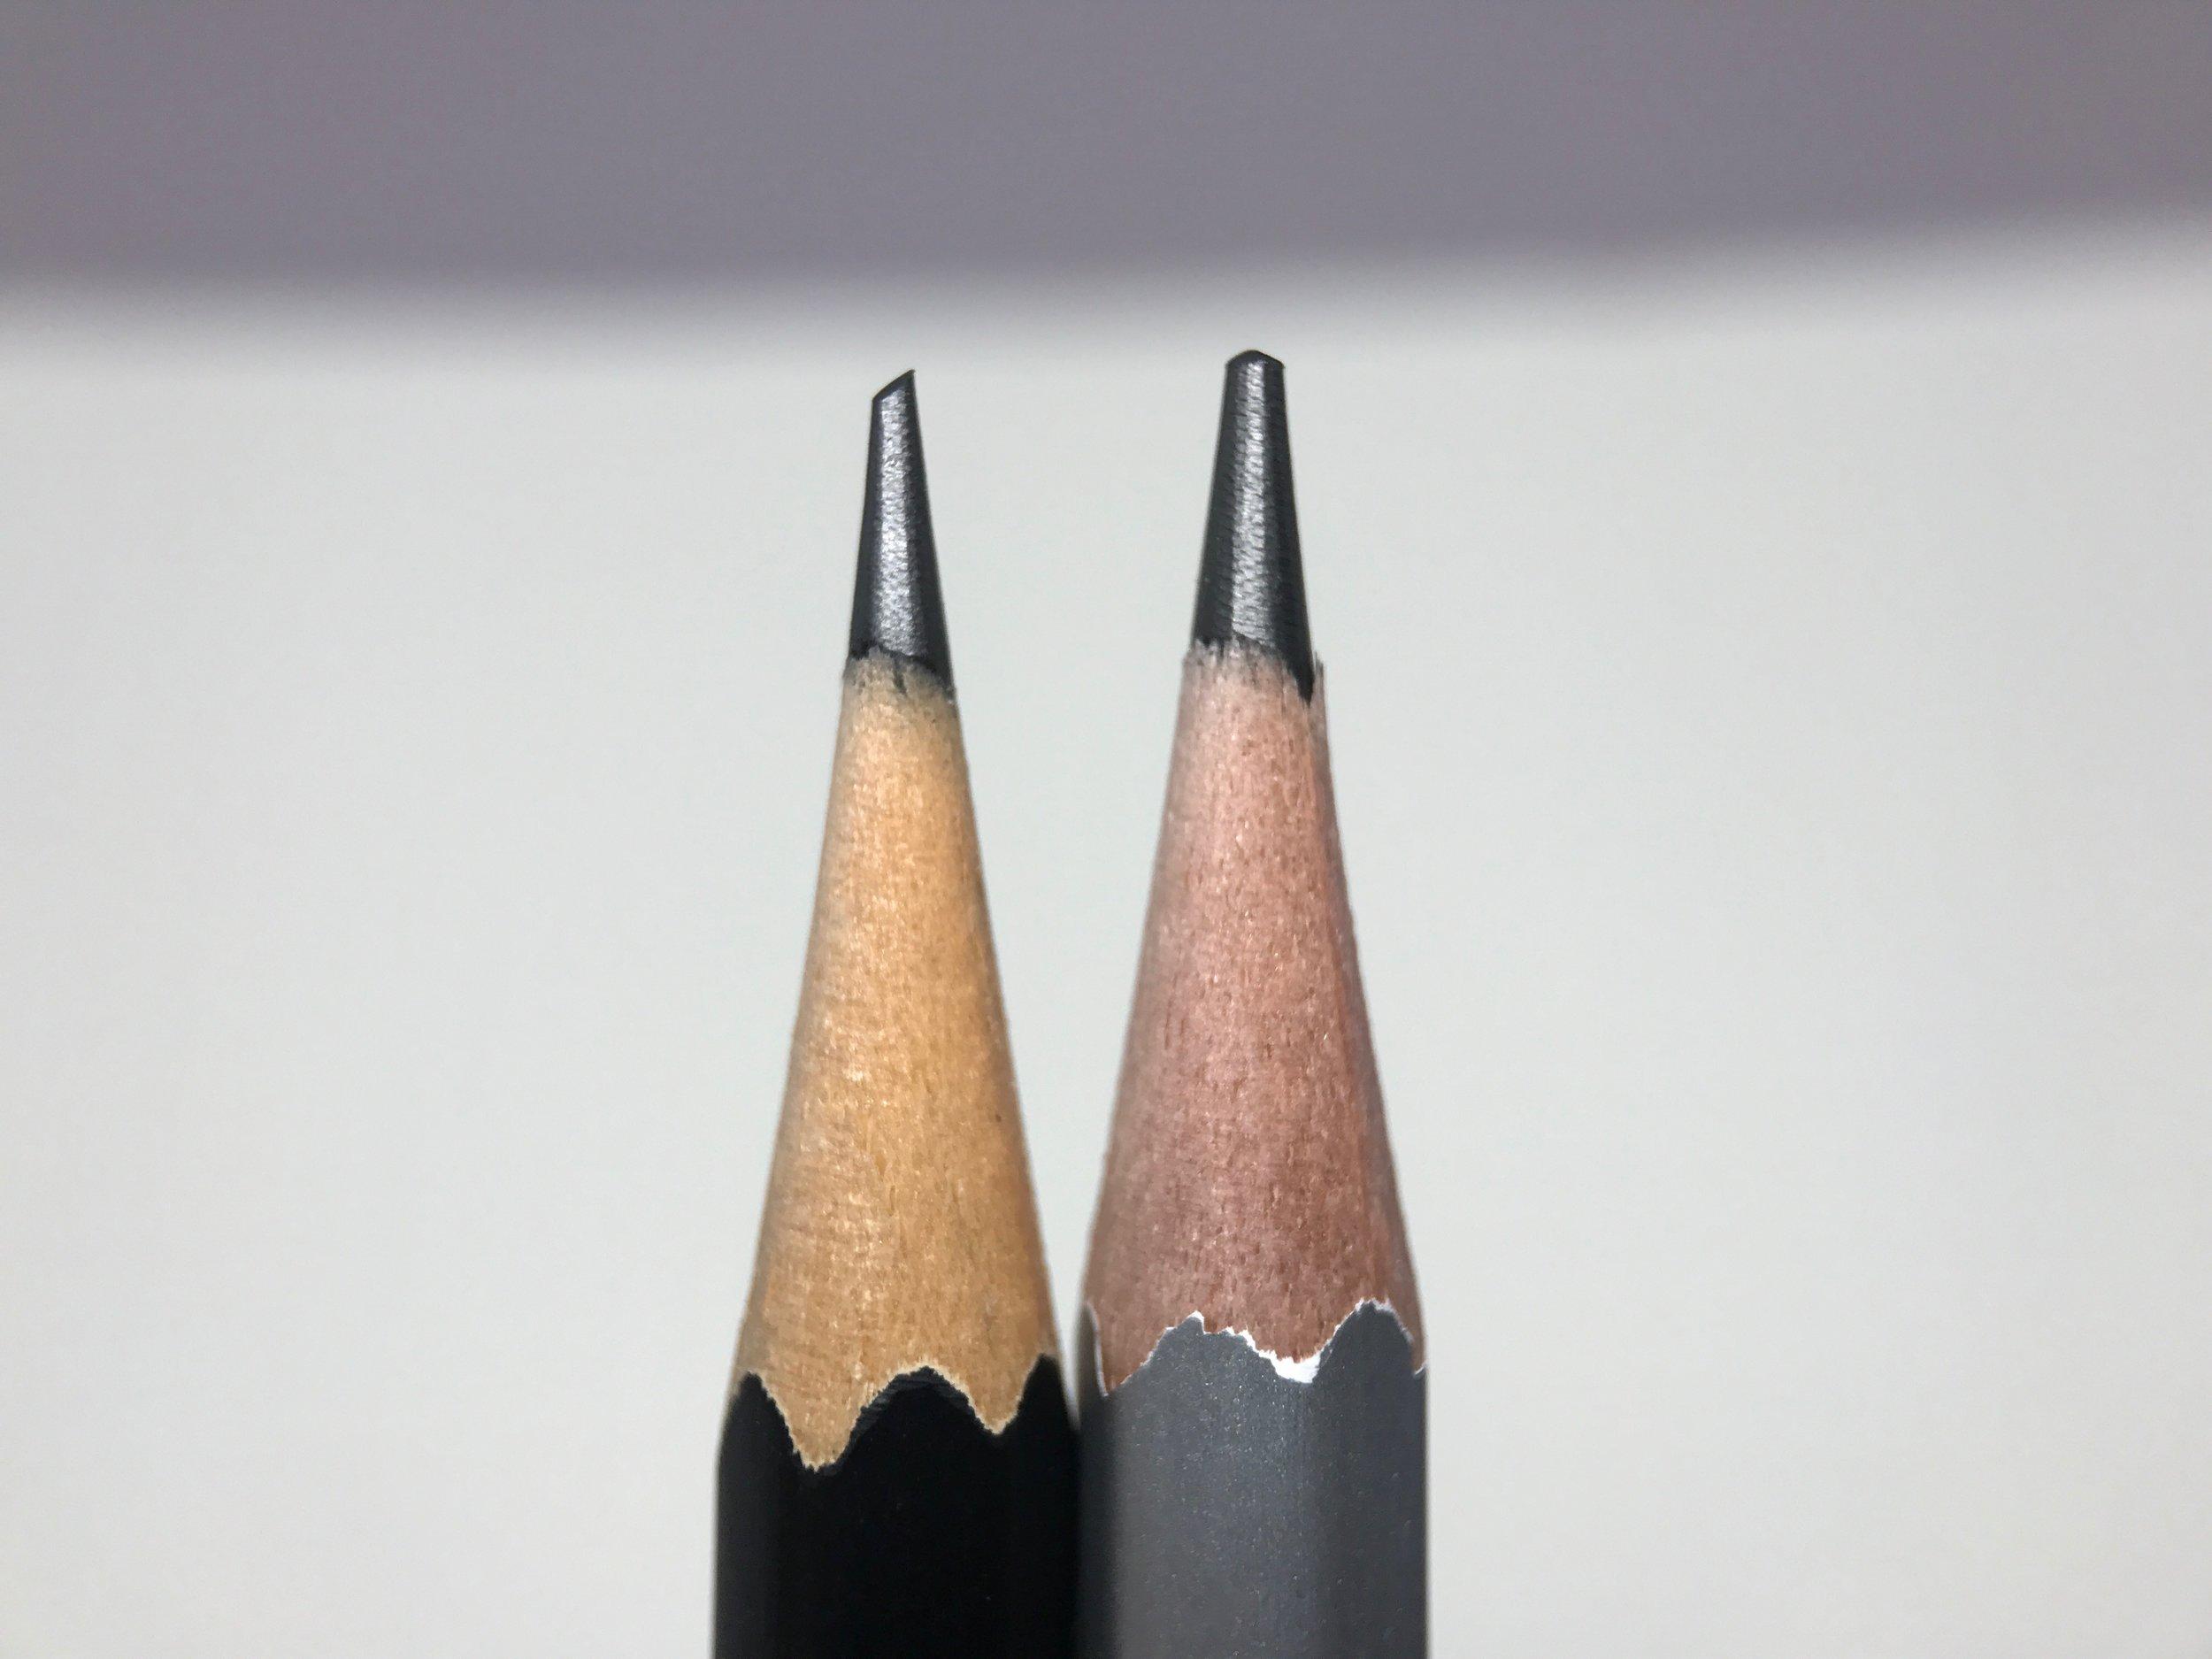 Stabilo-Exam-Grade-Pelikan-Exam-Standard-1.jpg